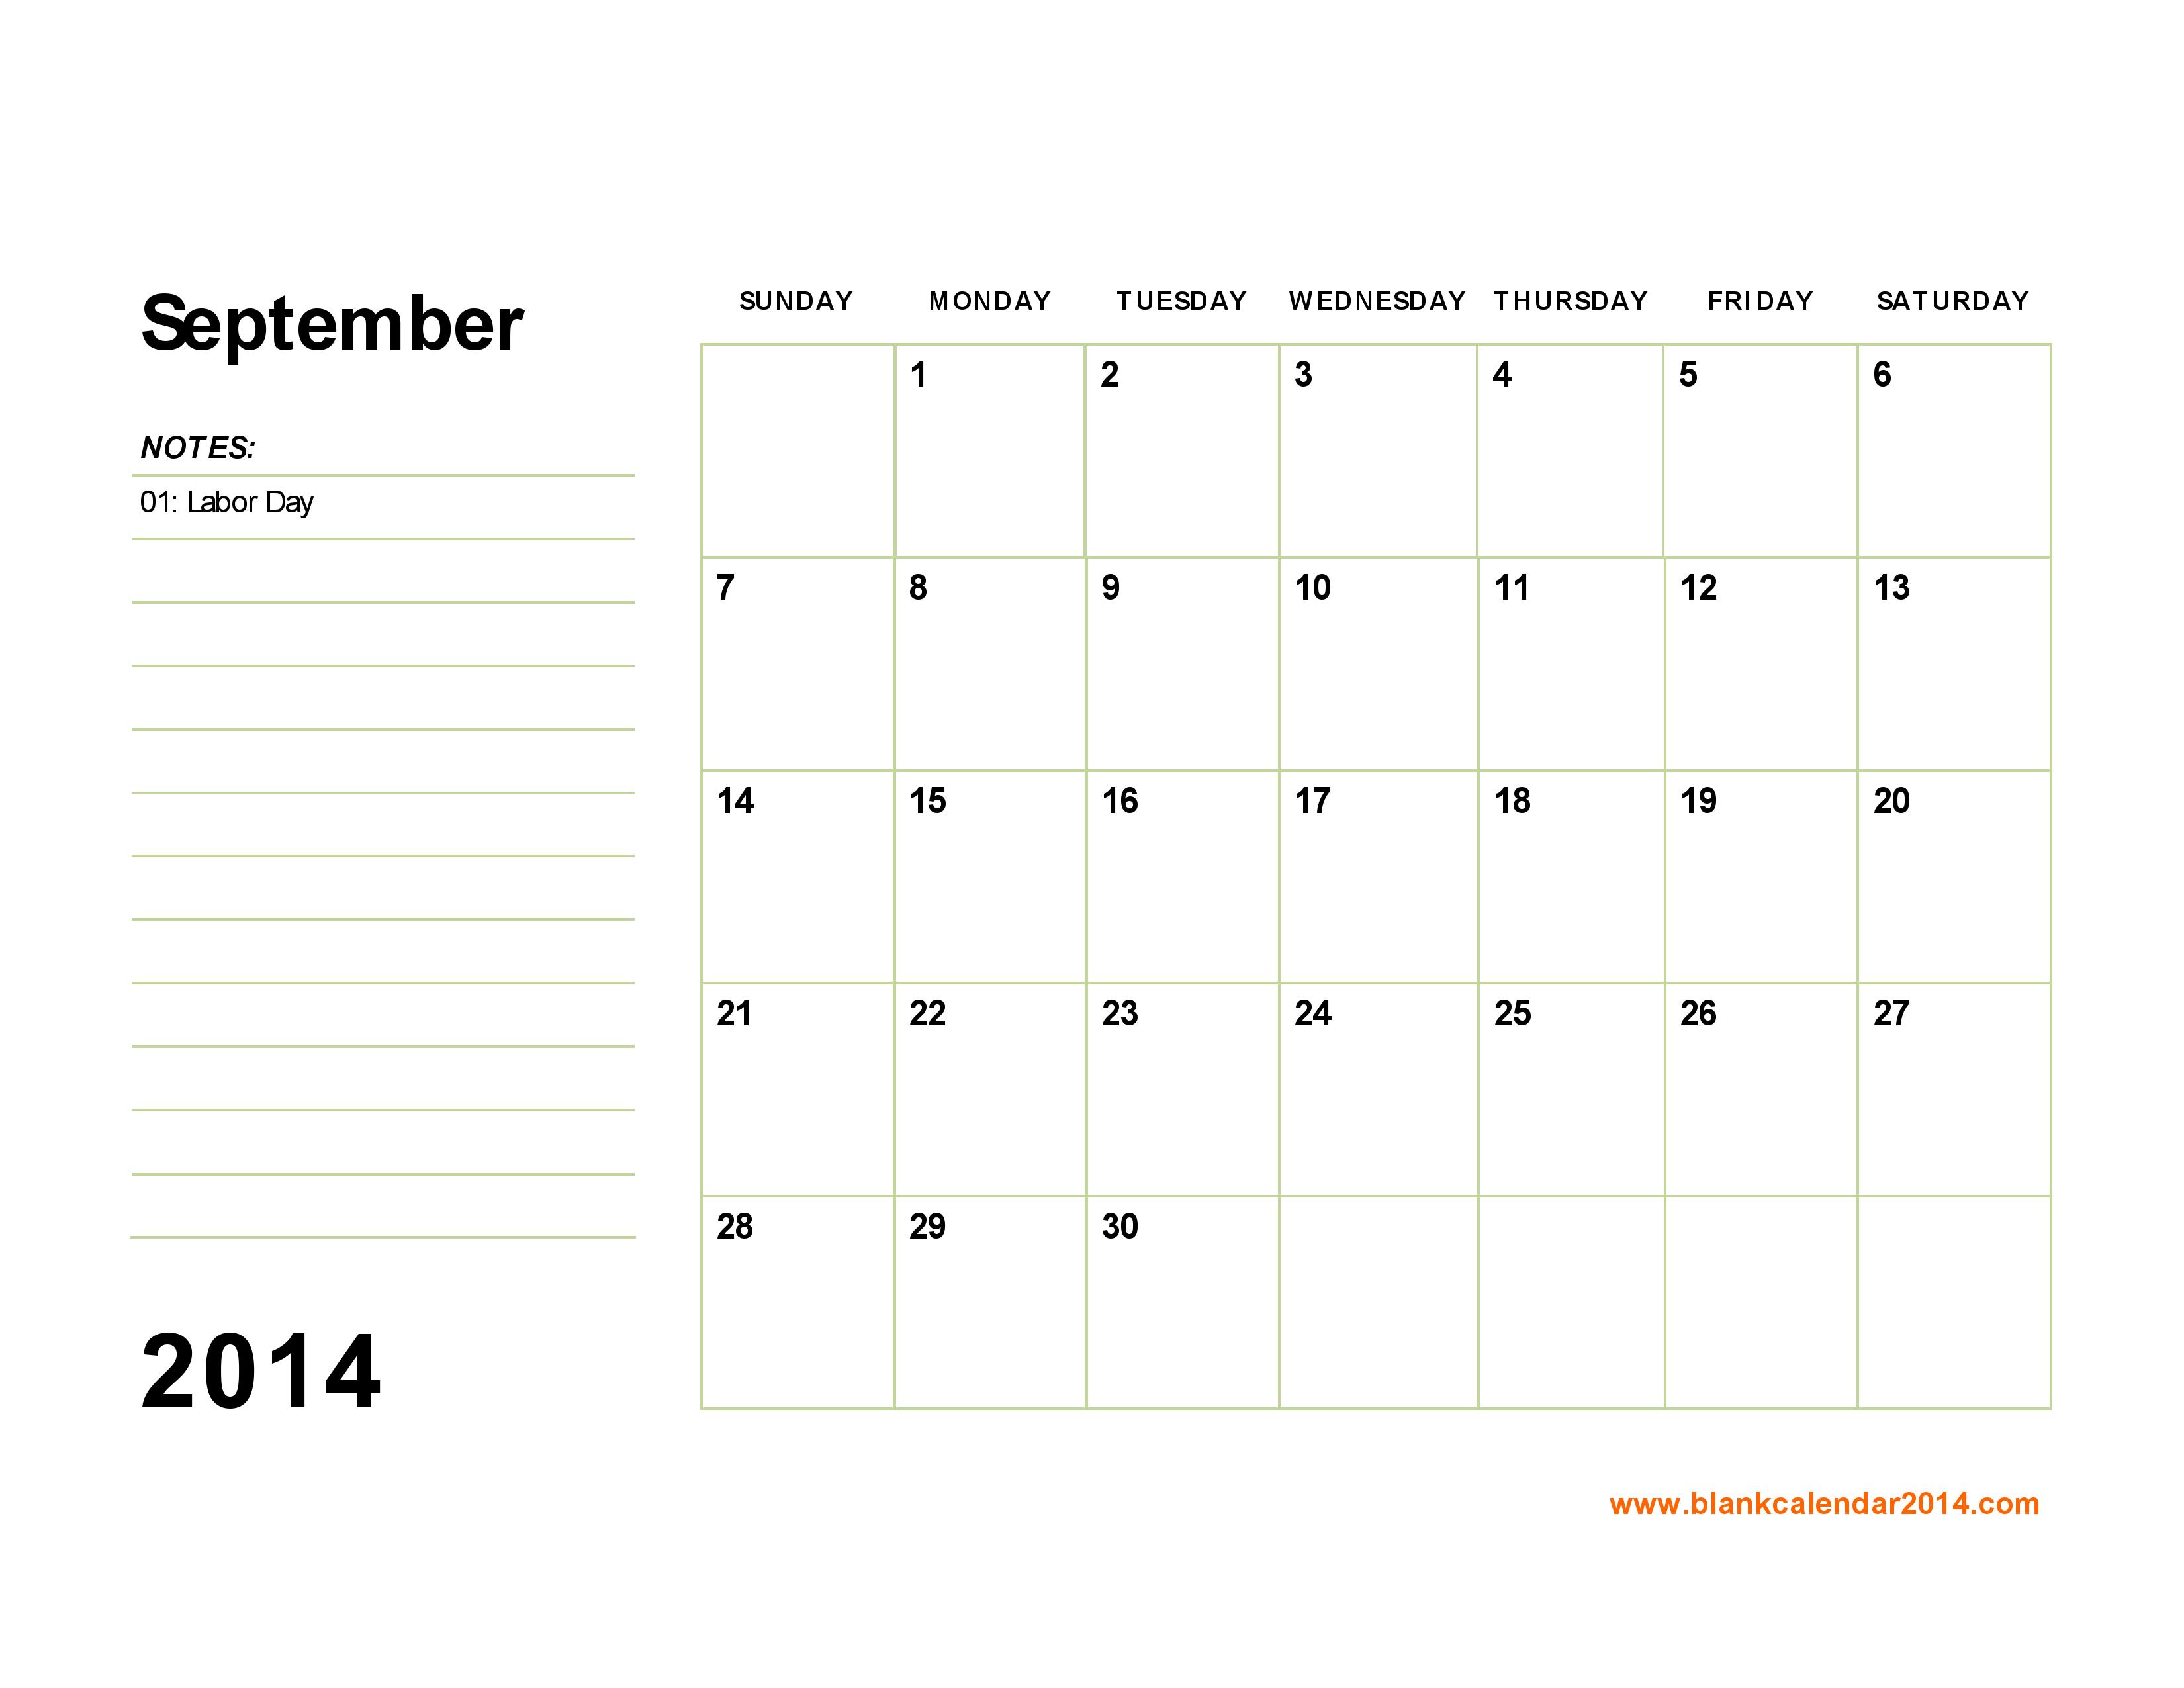 fillable calendar template 2014 - 9 best images of september 2014 calendar printable